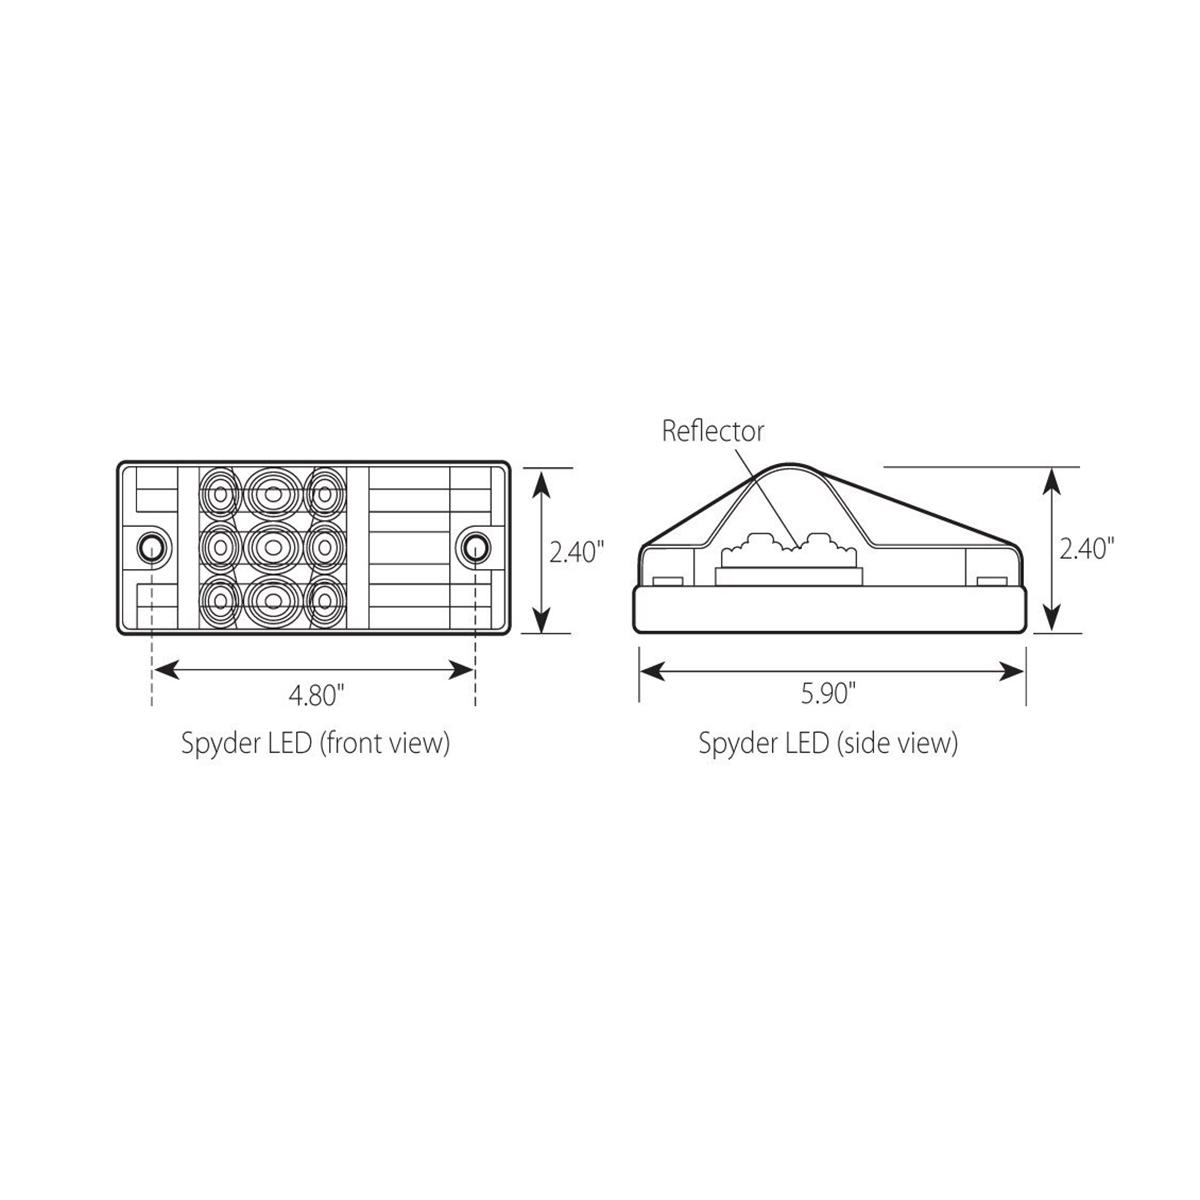 rectangular side mount spyder led turn  marker light - grand general